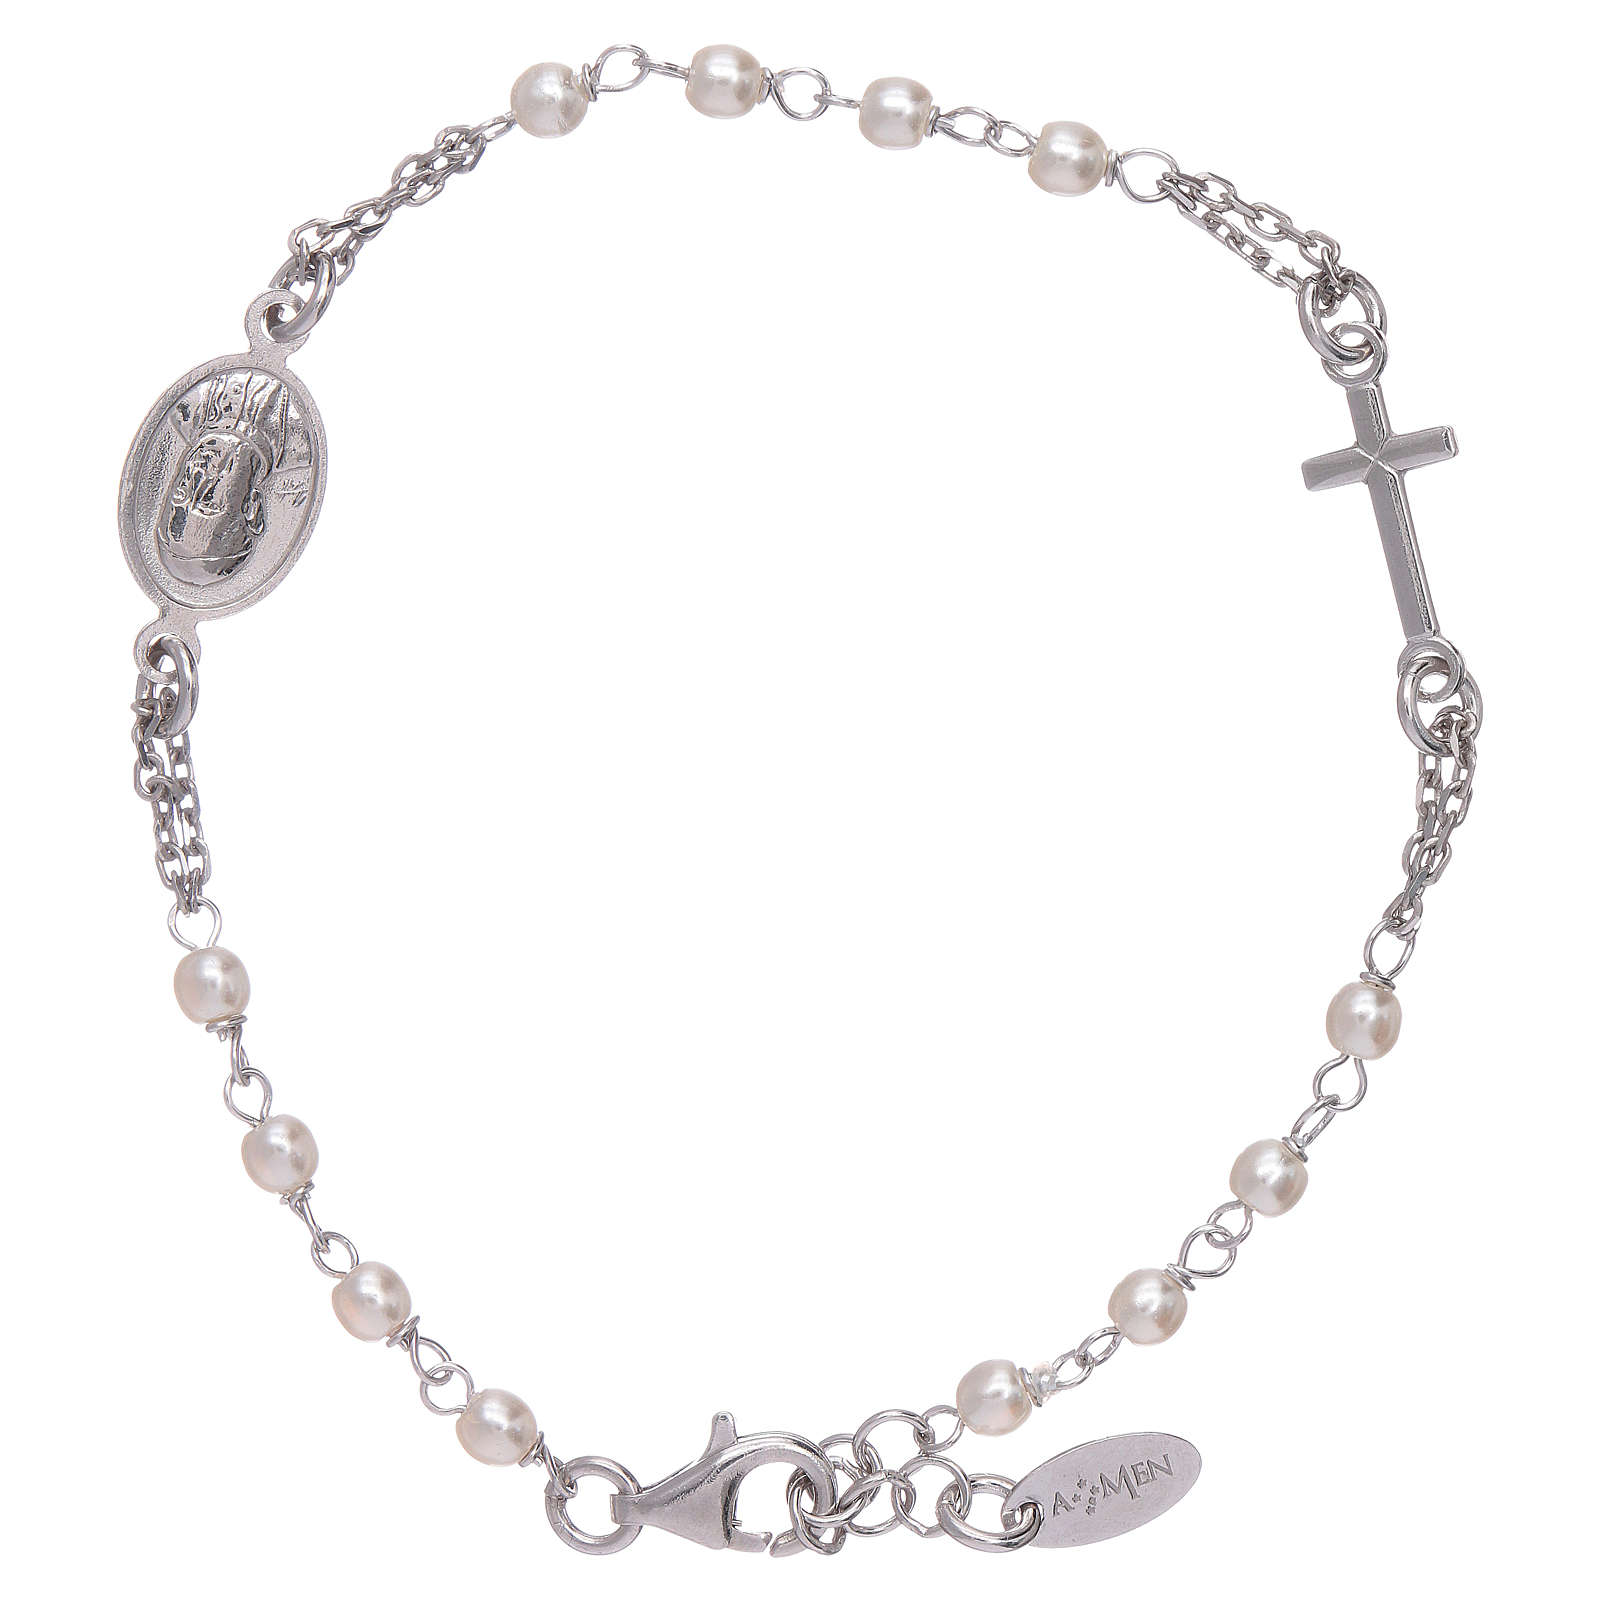 AMEN Jubilee rosary bracelet Swarovski beads and 925 sterling silver 4